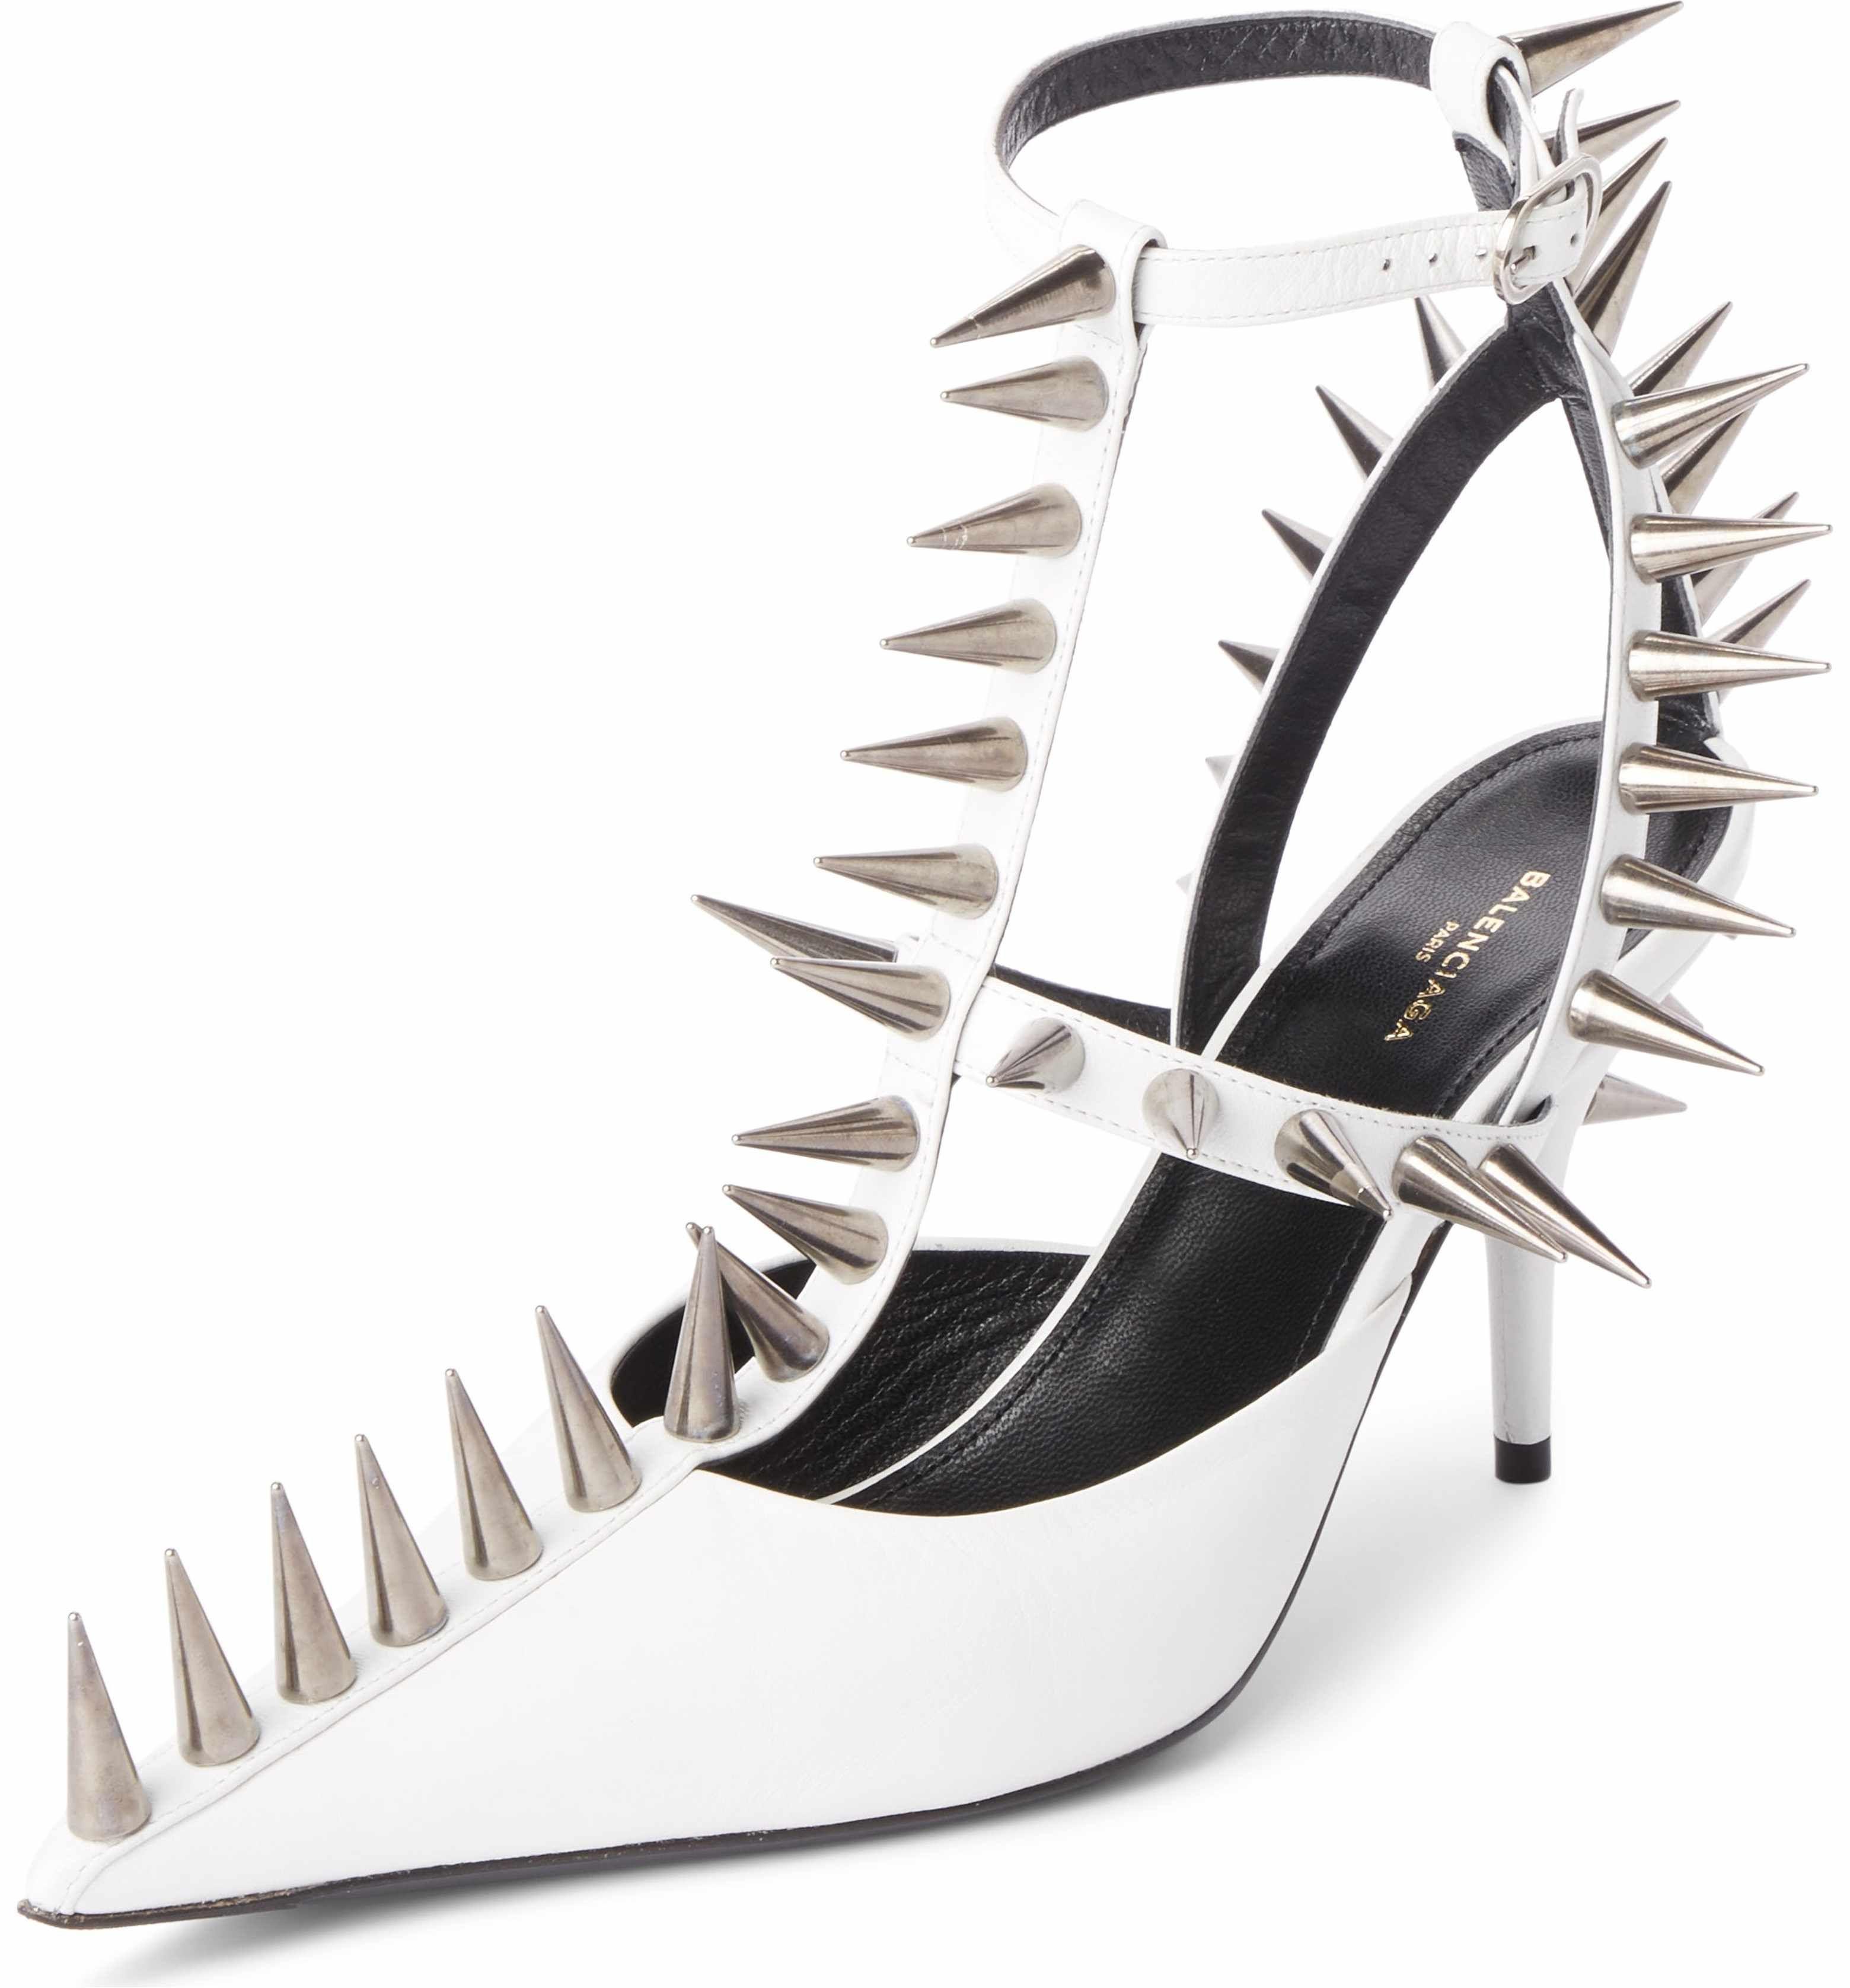 60b38d003e Main Image - Balenciaga Metal Spike Slingback Pump (Women) | Art ...